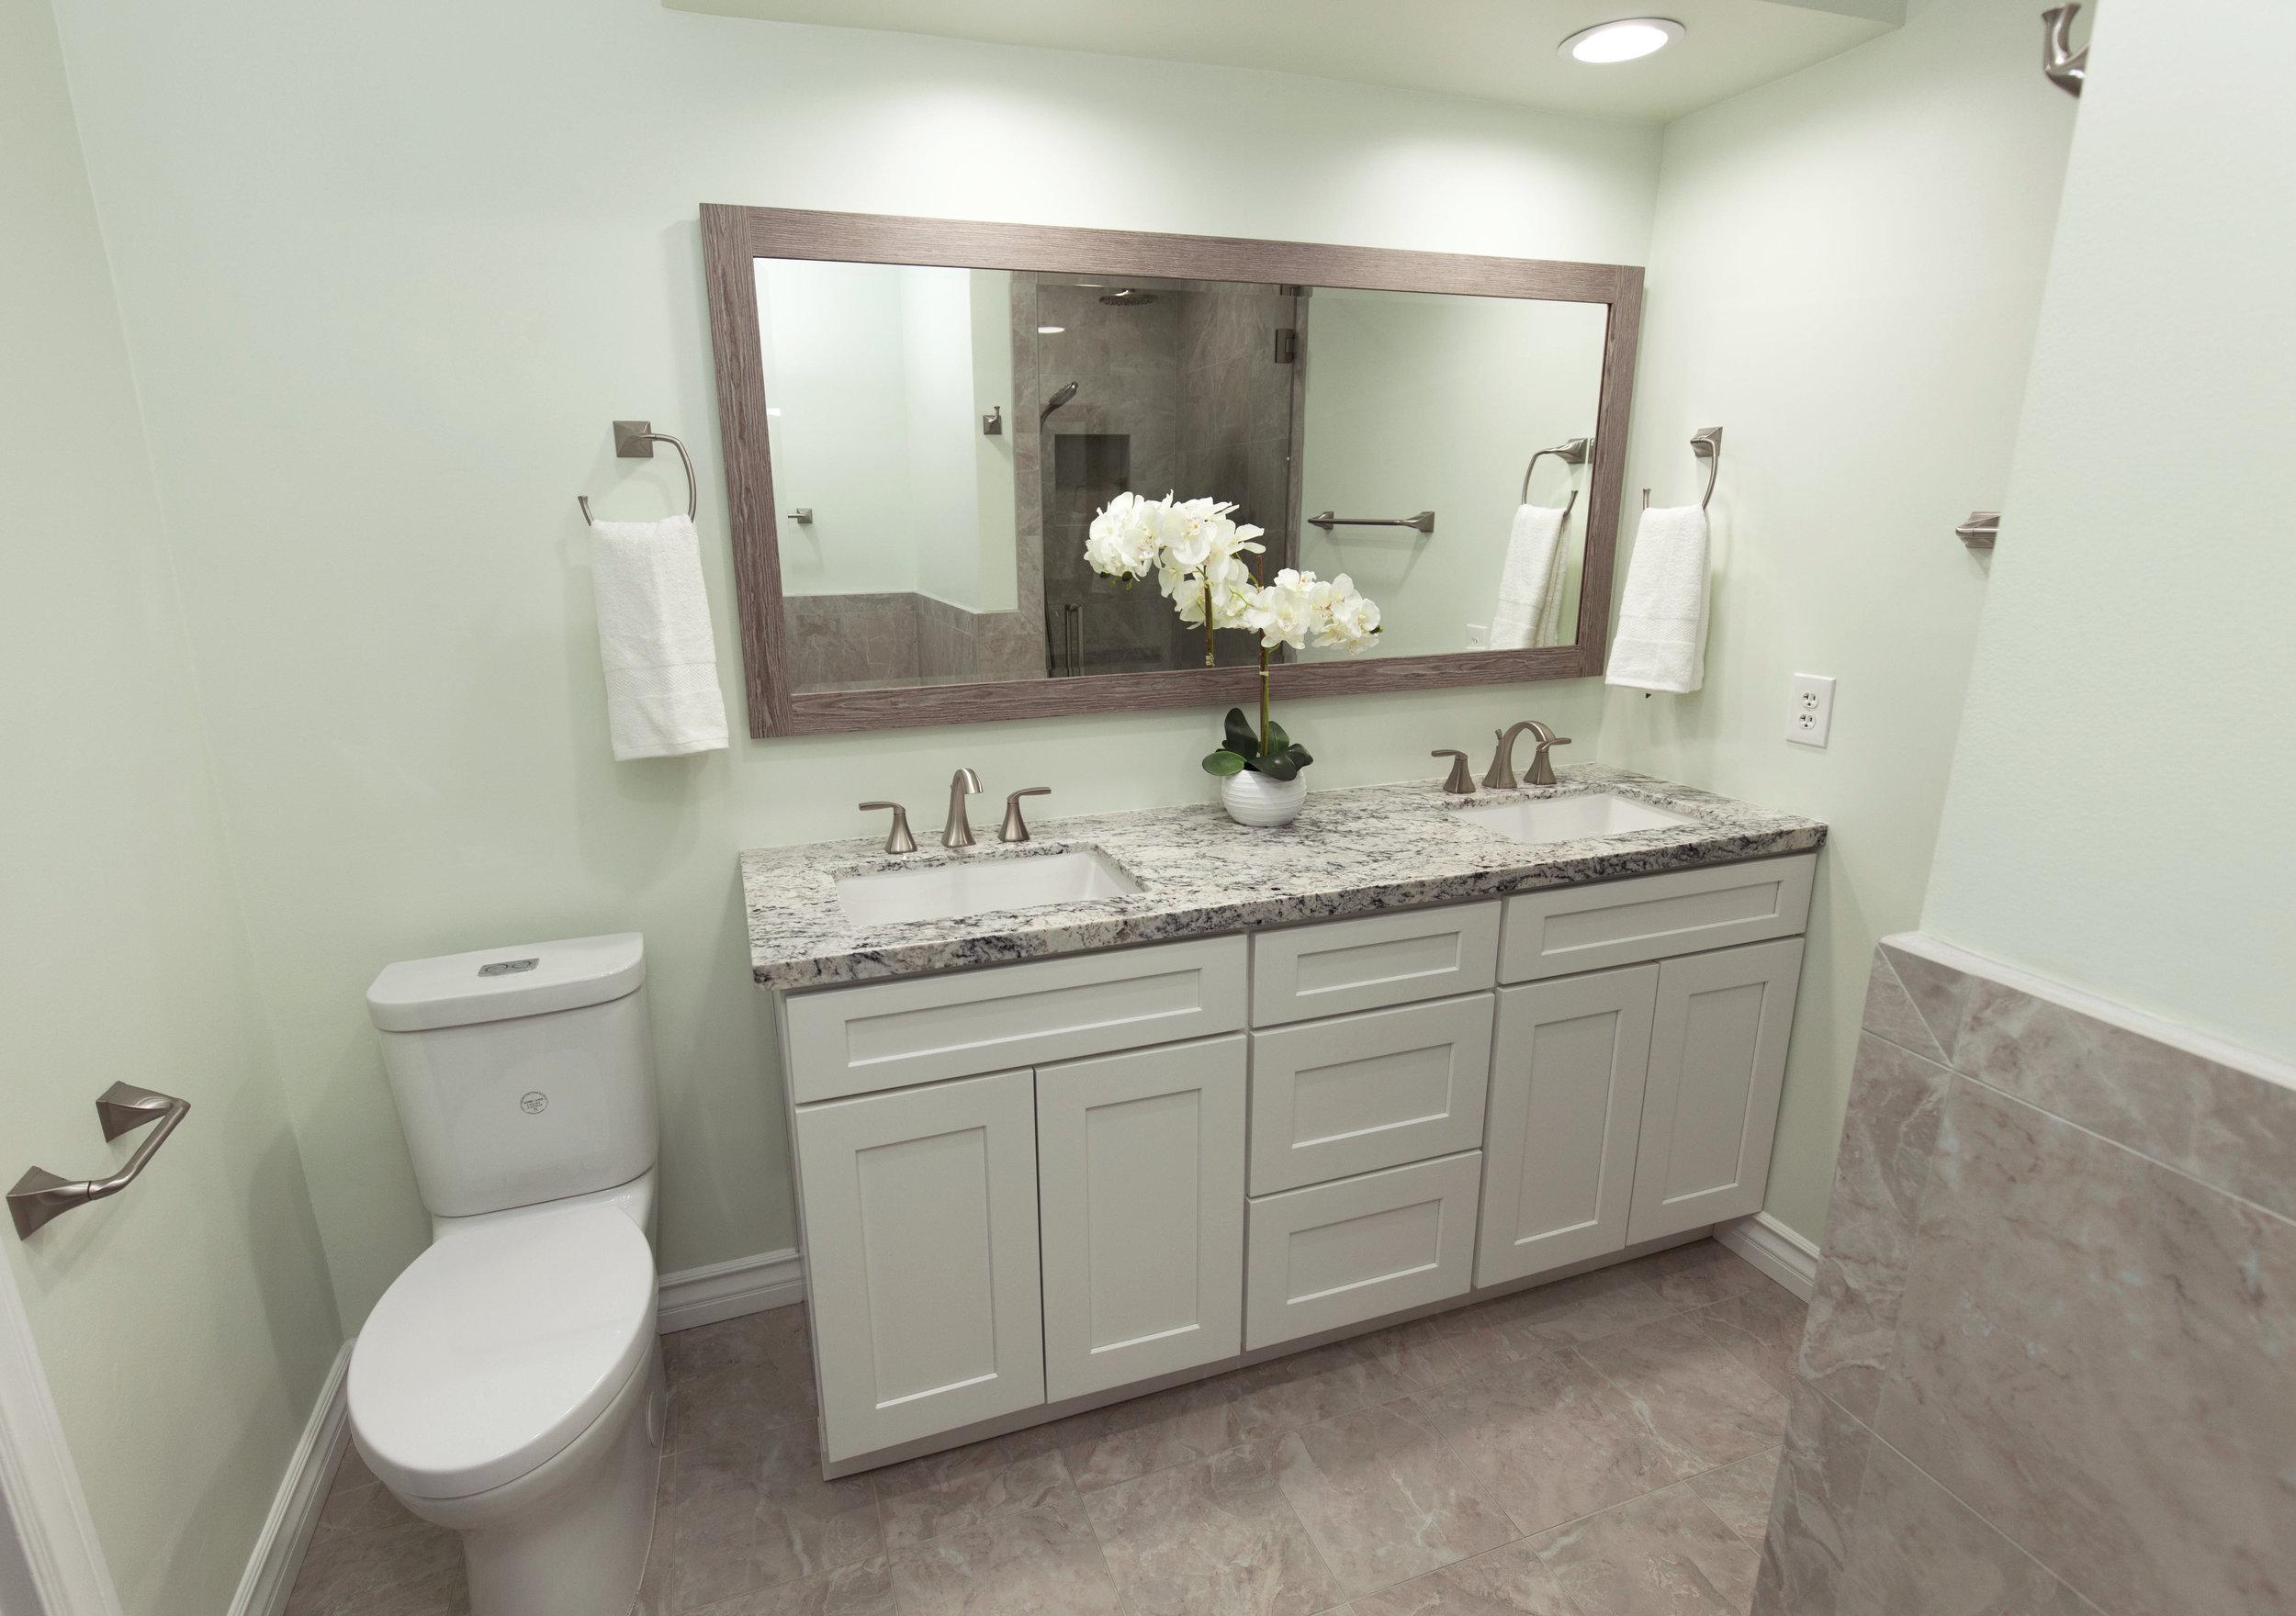 Bathroom My Edit.jpg